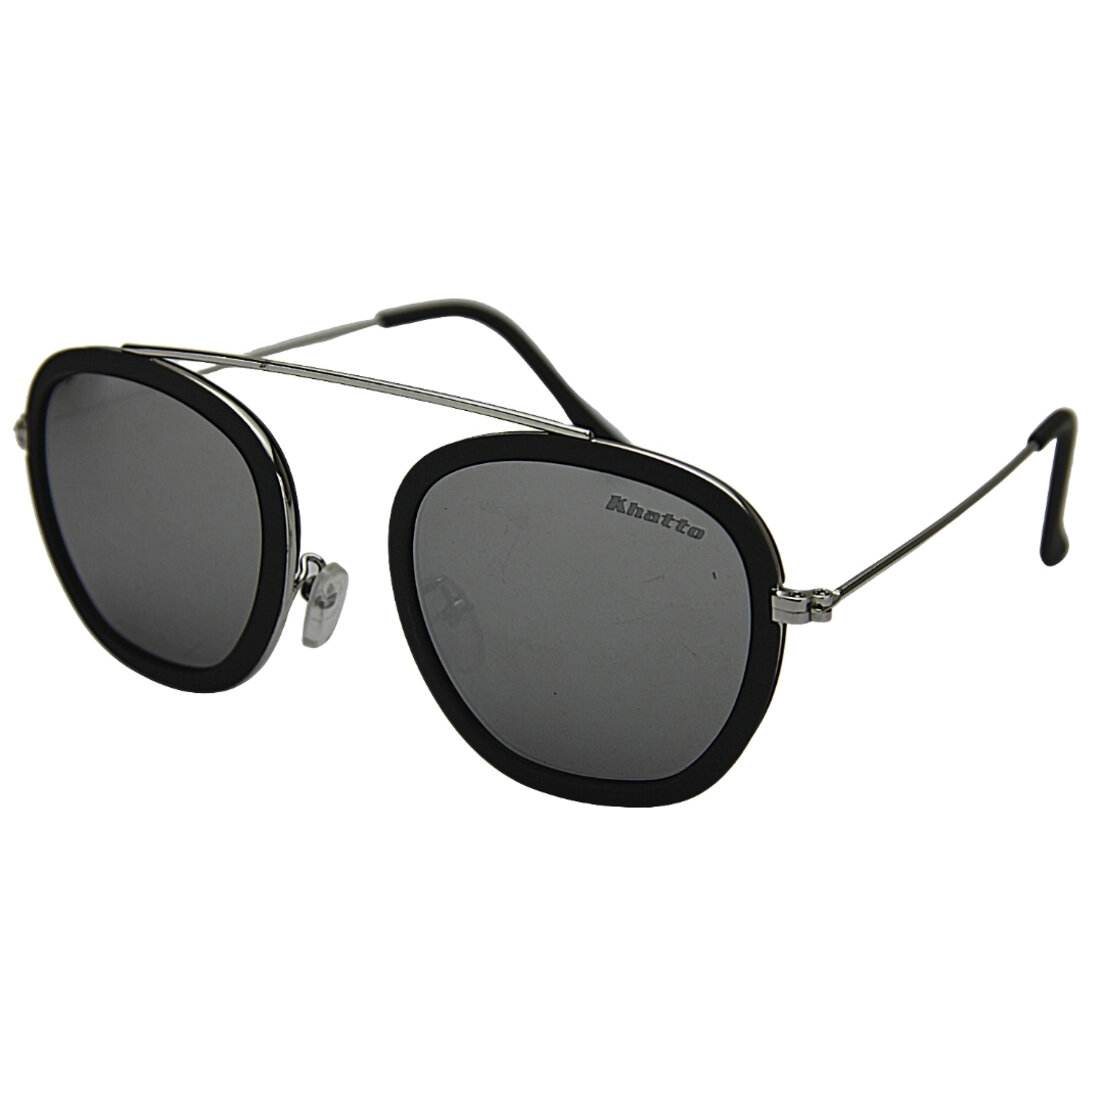 Óculos de Sol Khatto Round Piper Less - PU